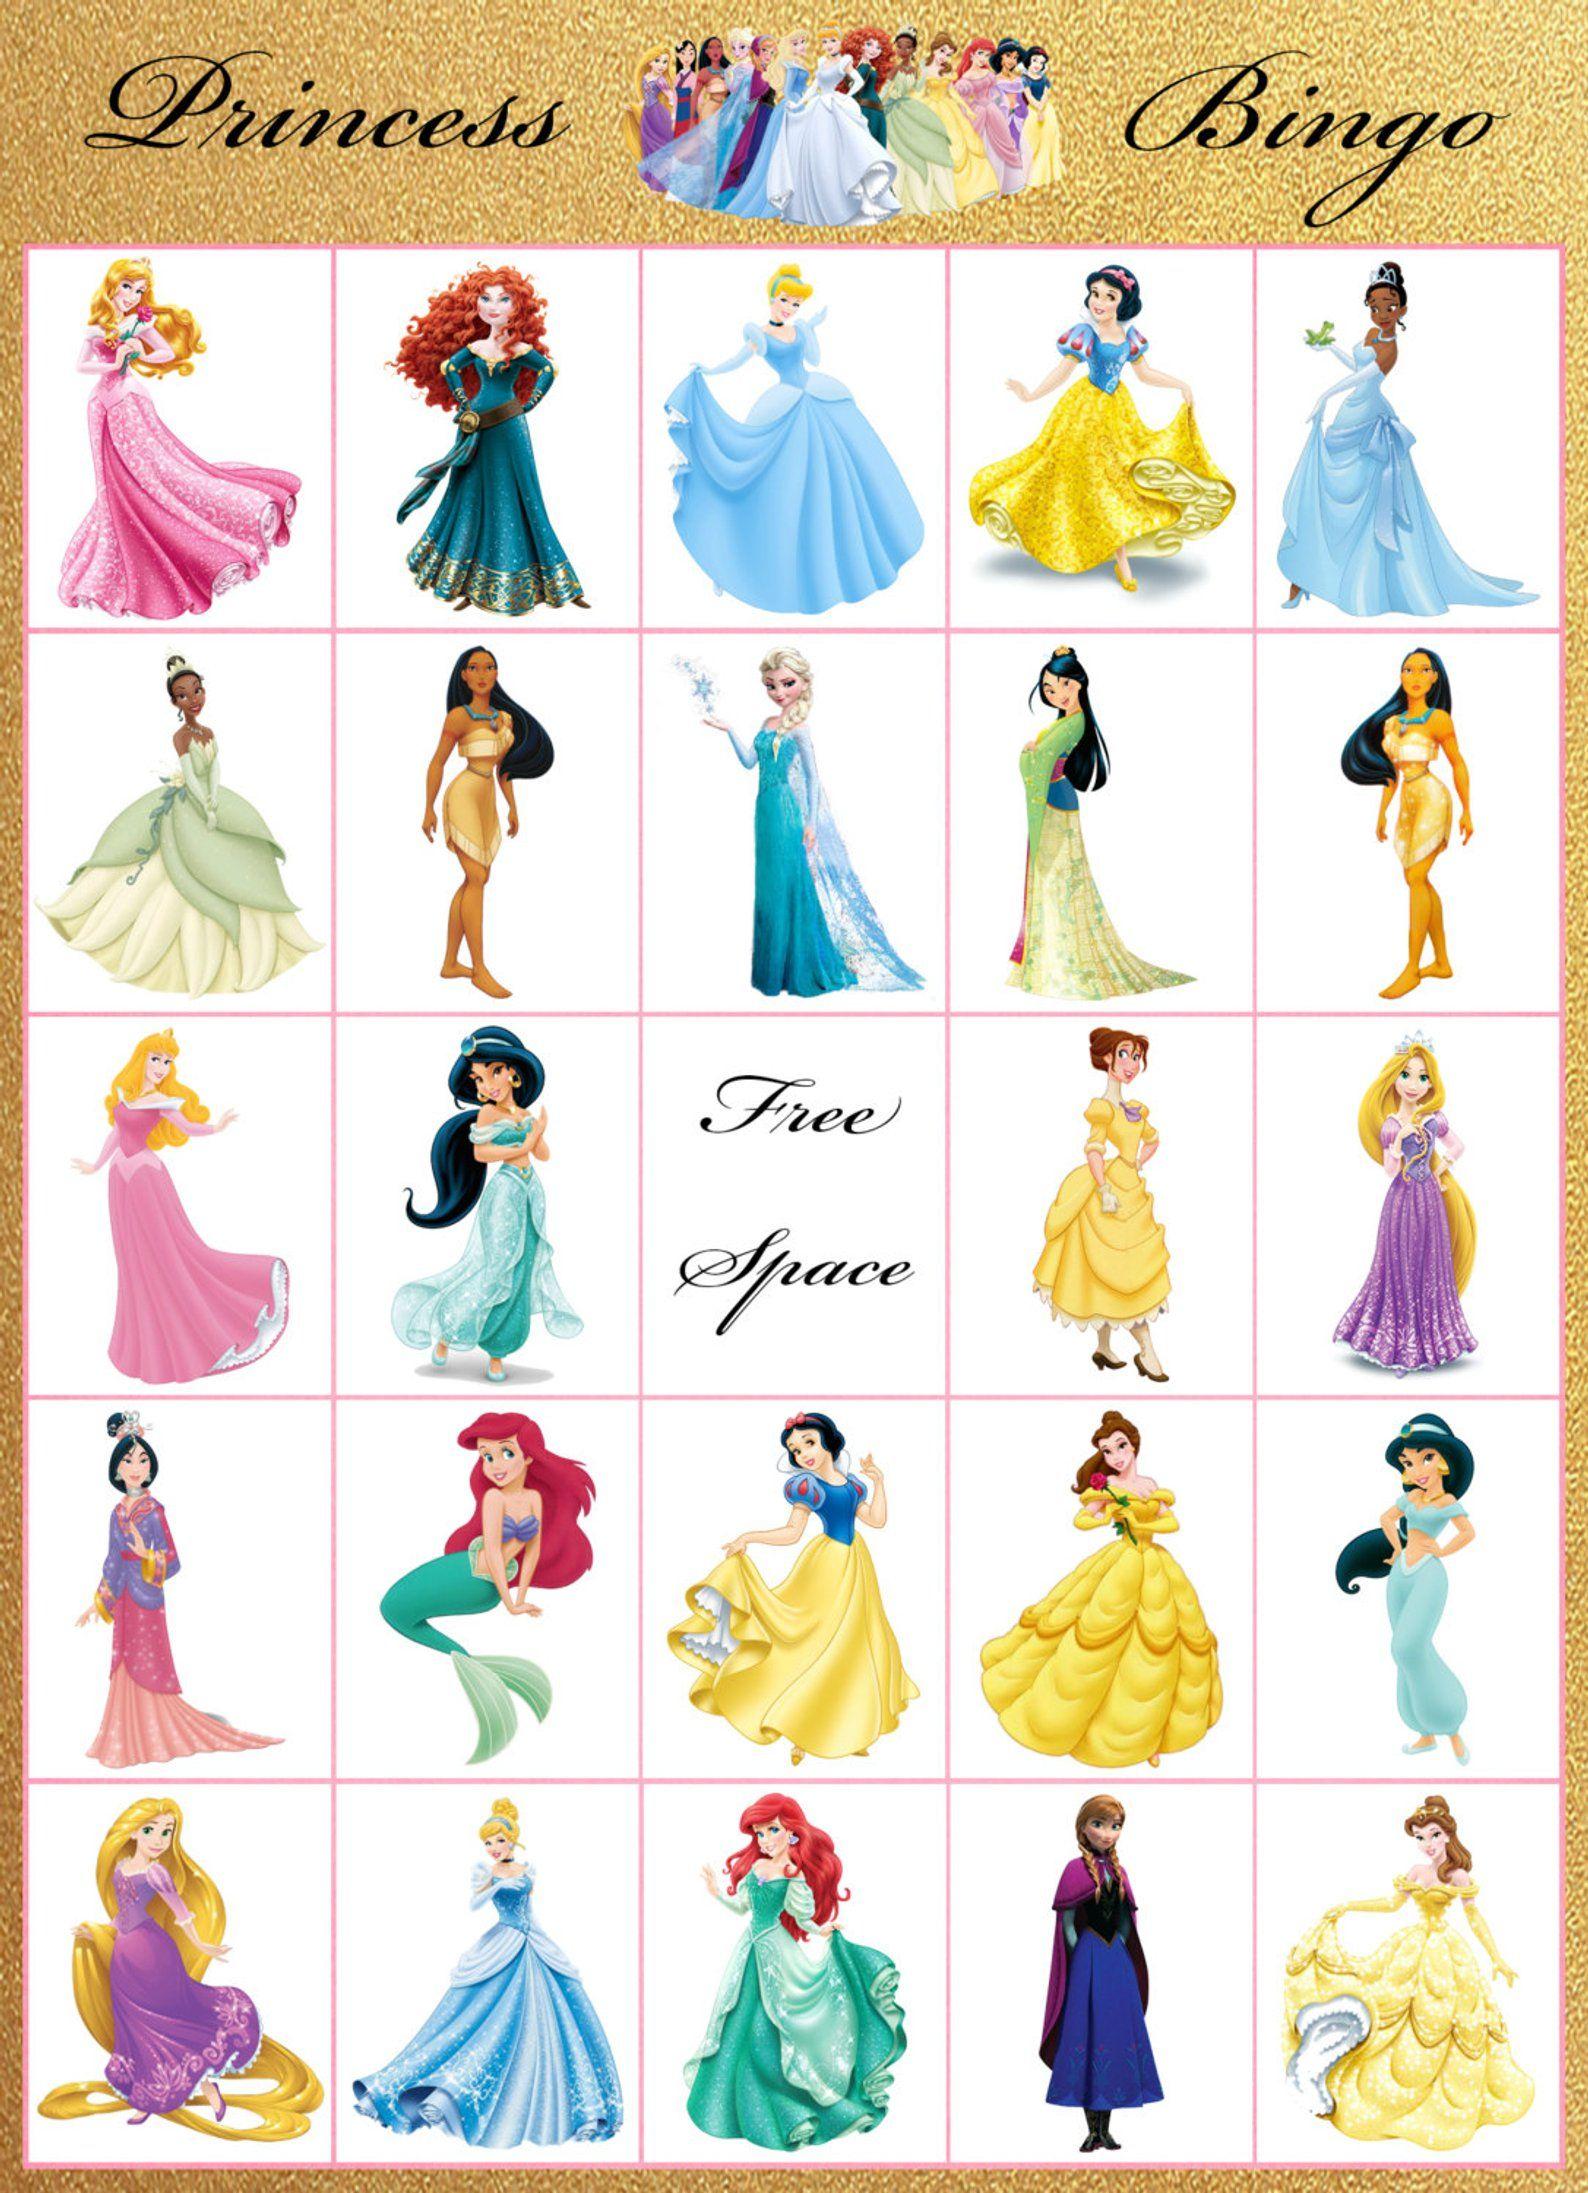 Princess Bingo 12 Card Princess Bingo Disney Princess Tea Party